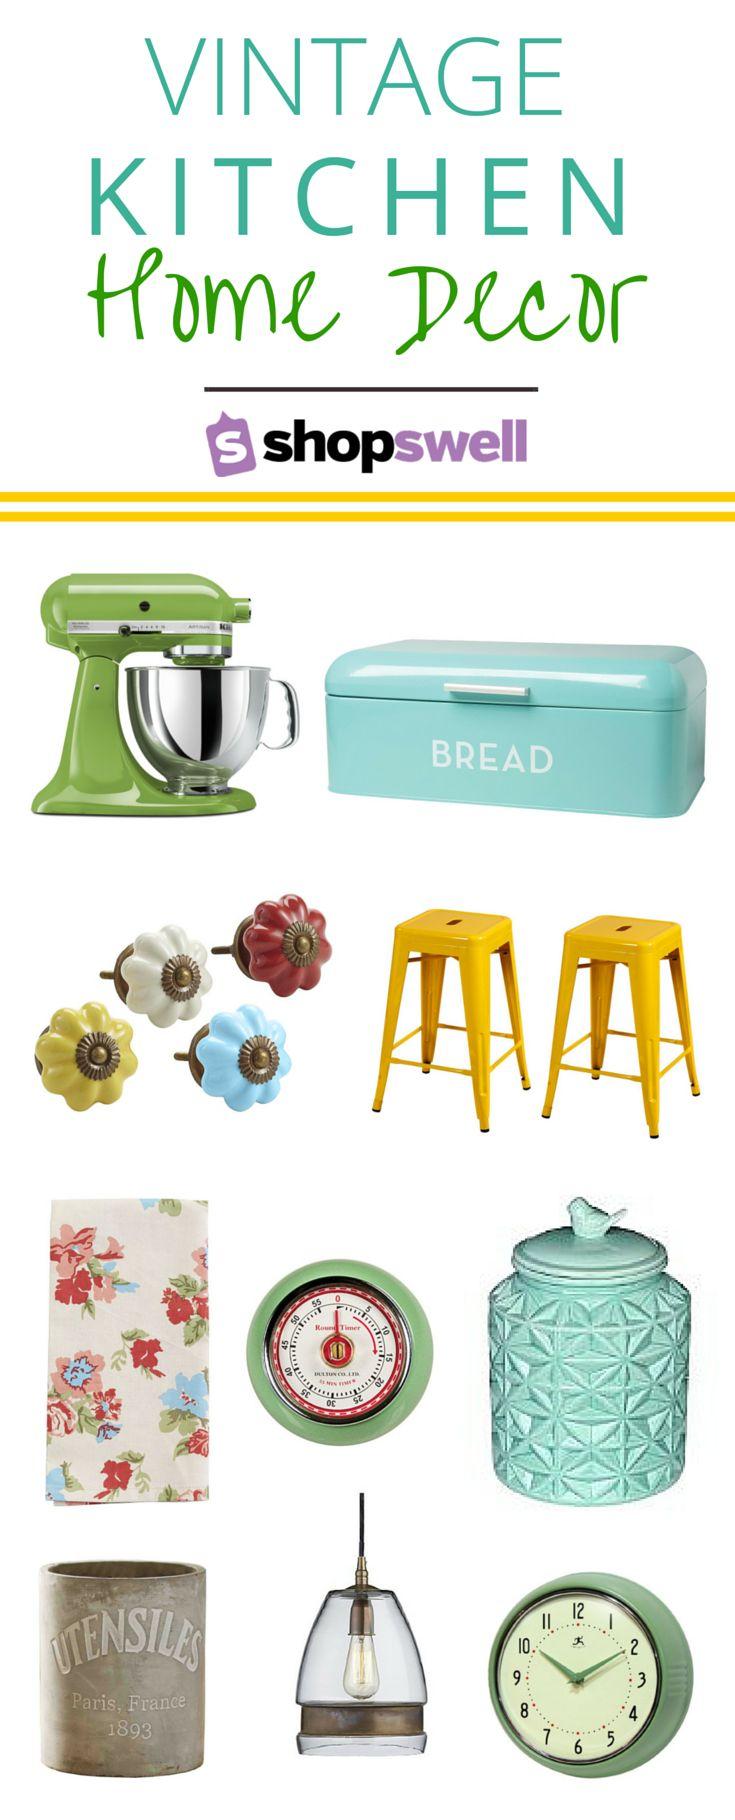 Vintage Kitchen for your home decorating inspiration.